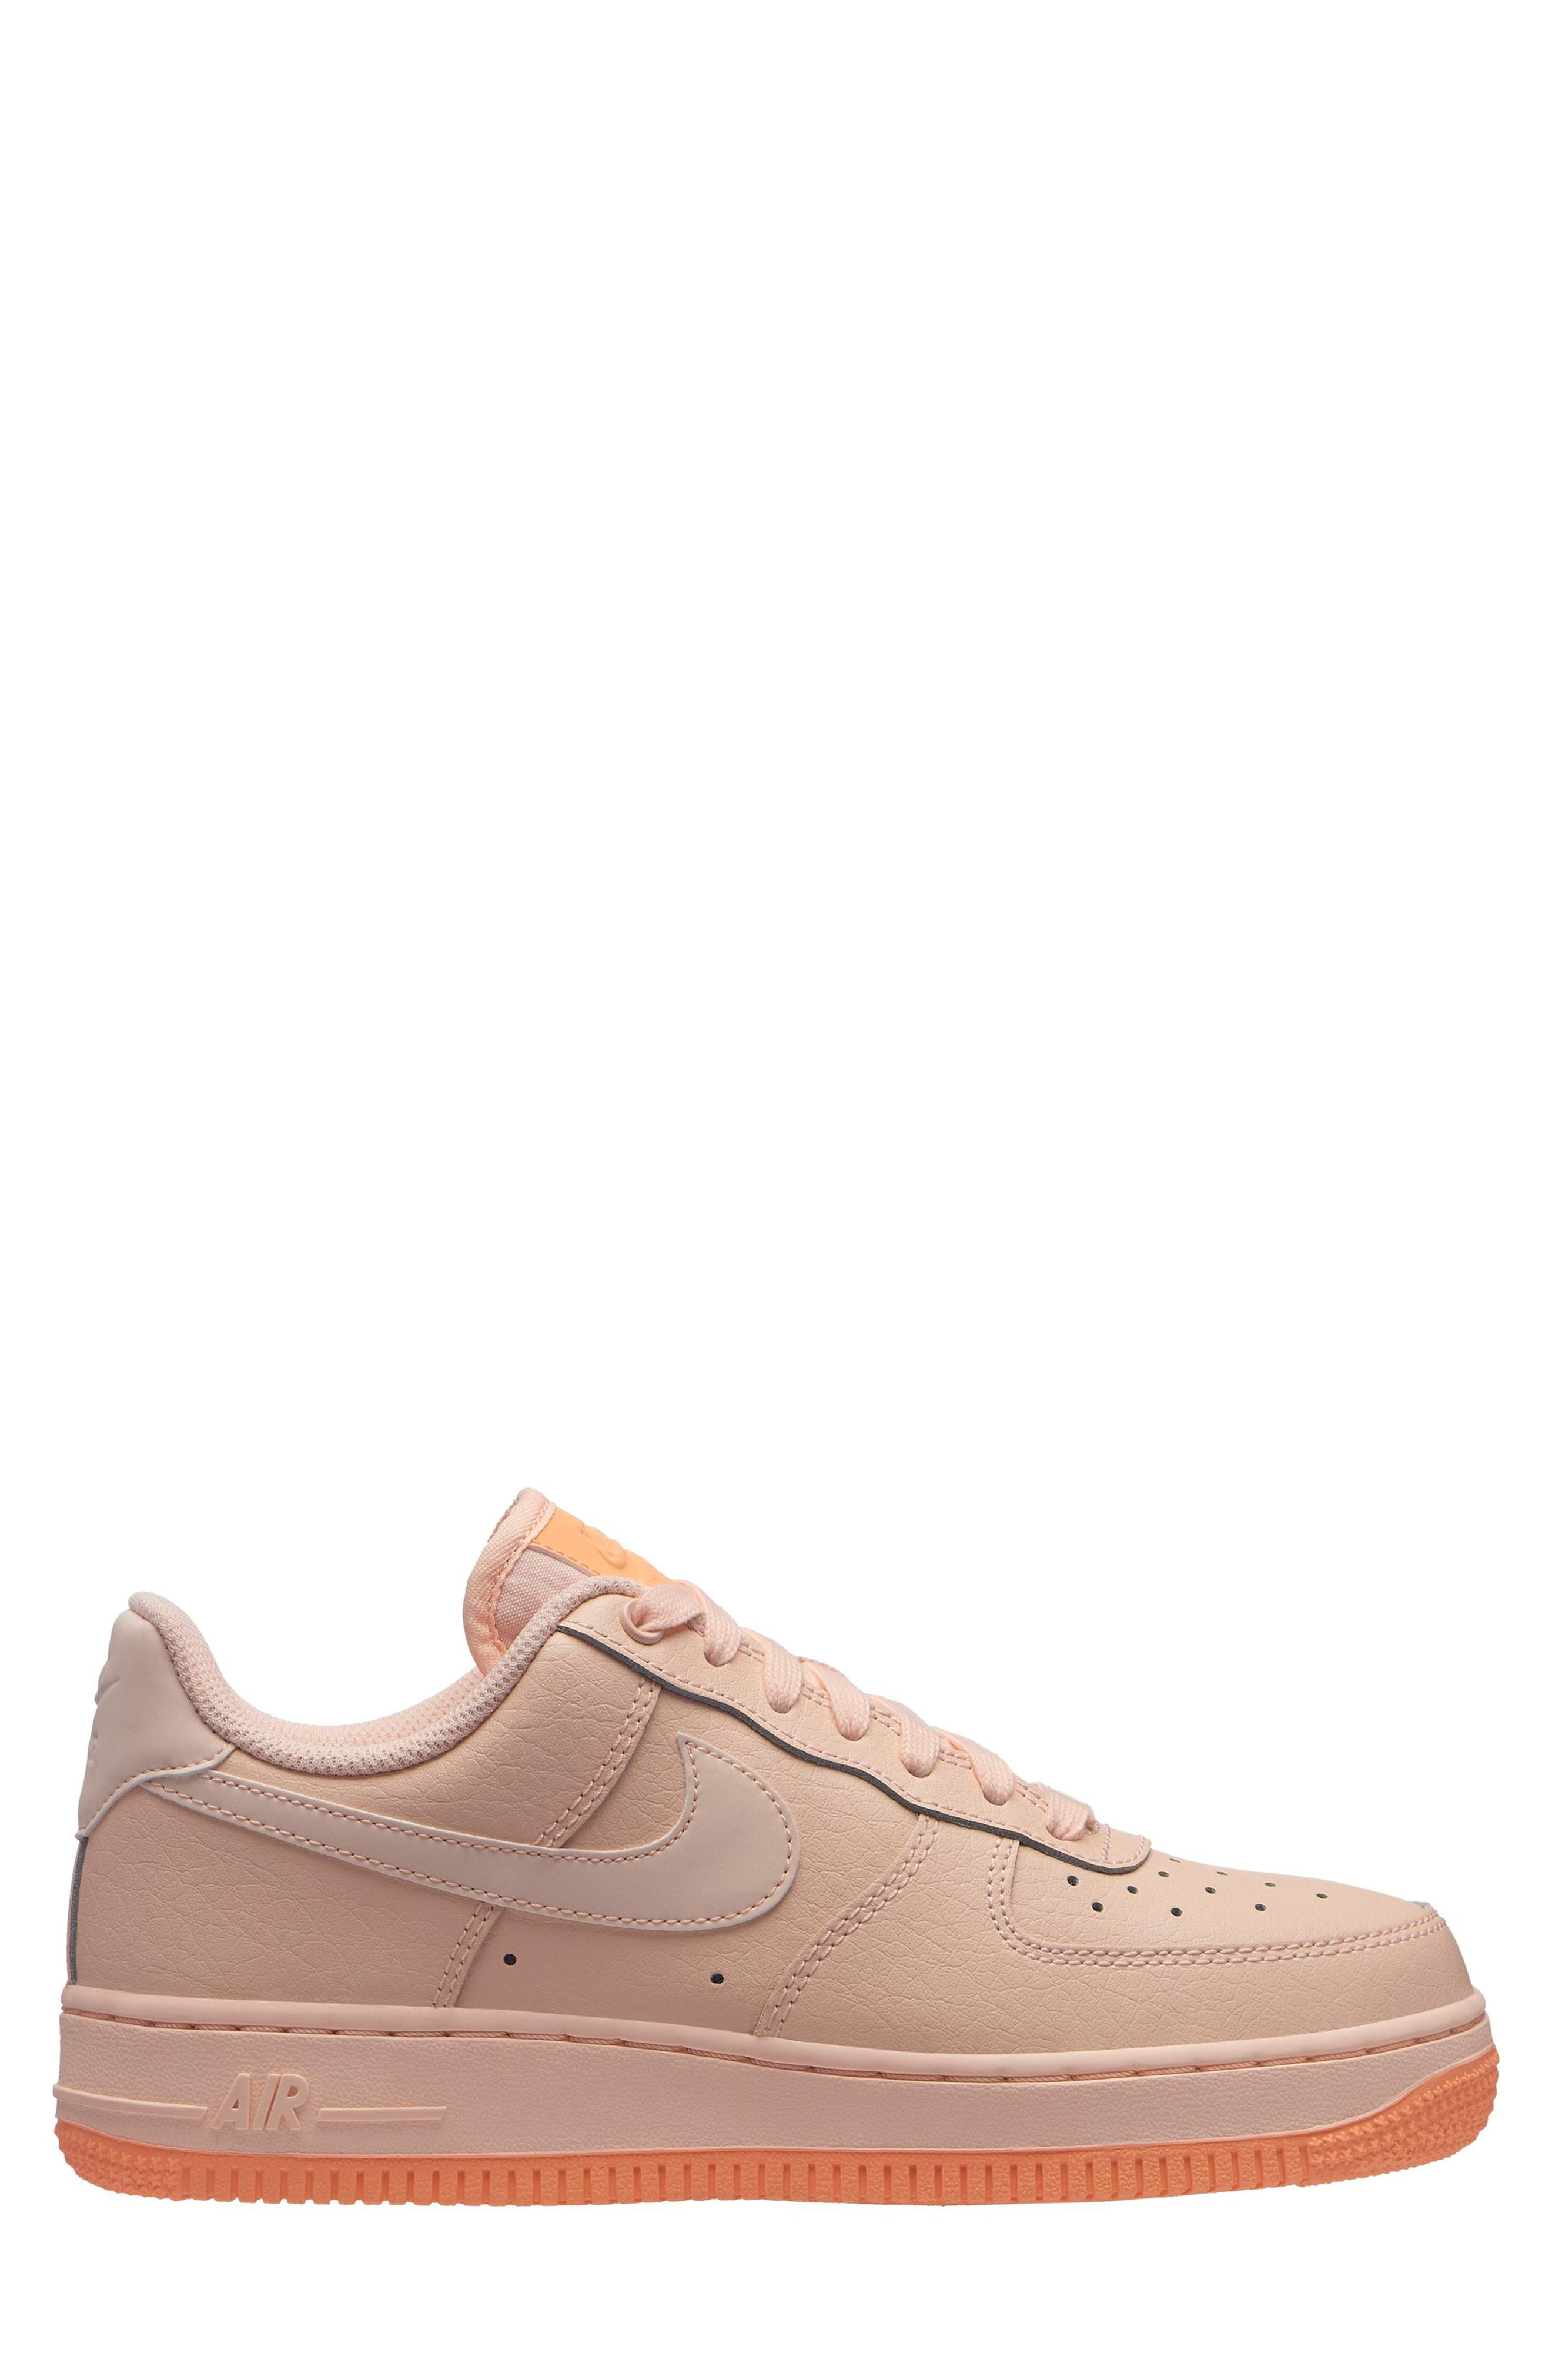 nike air force 1 07 essential donna